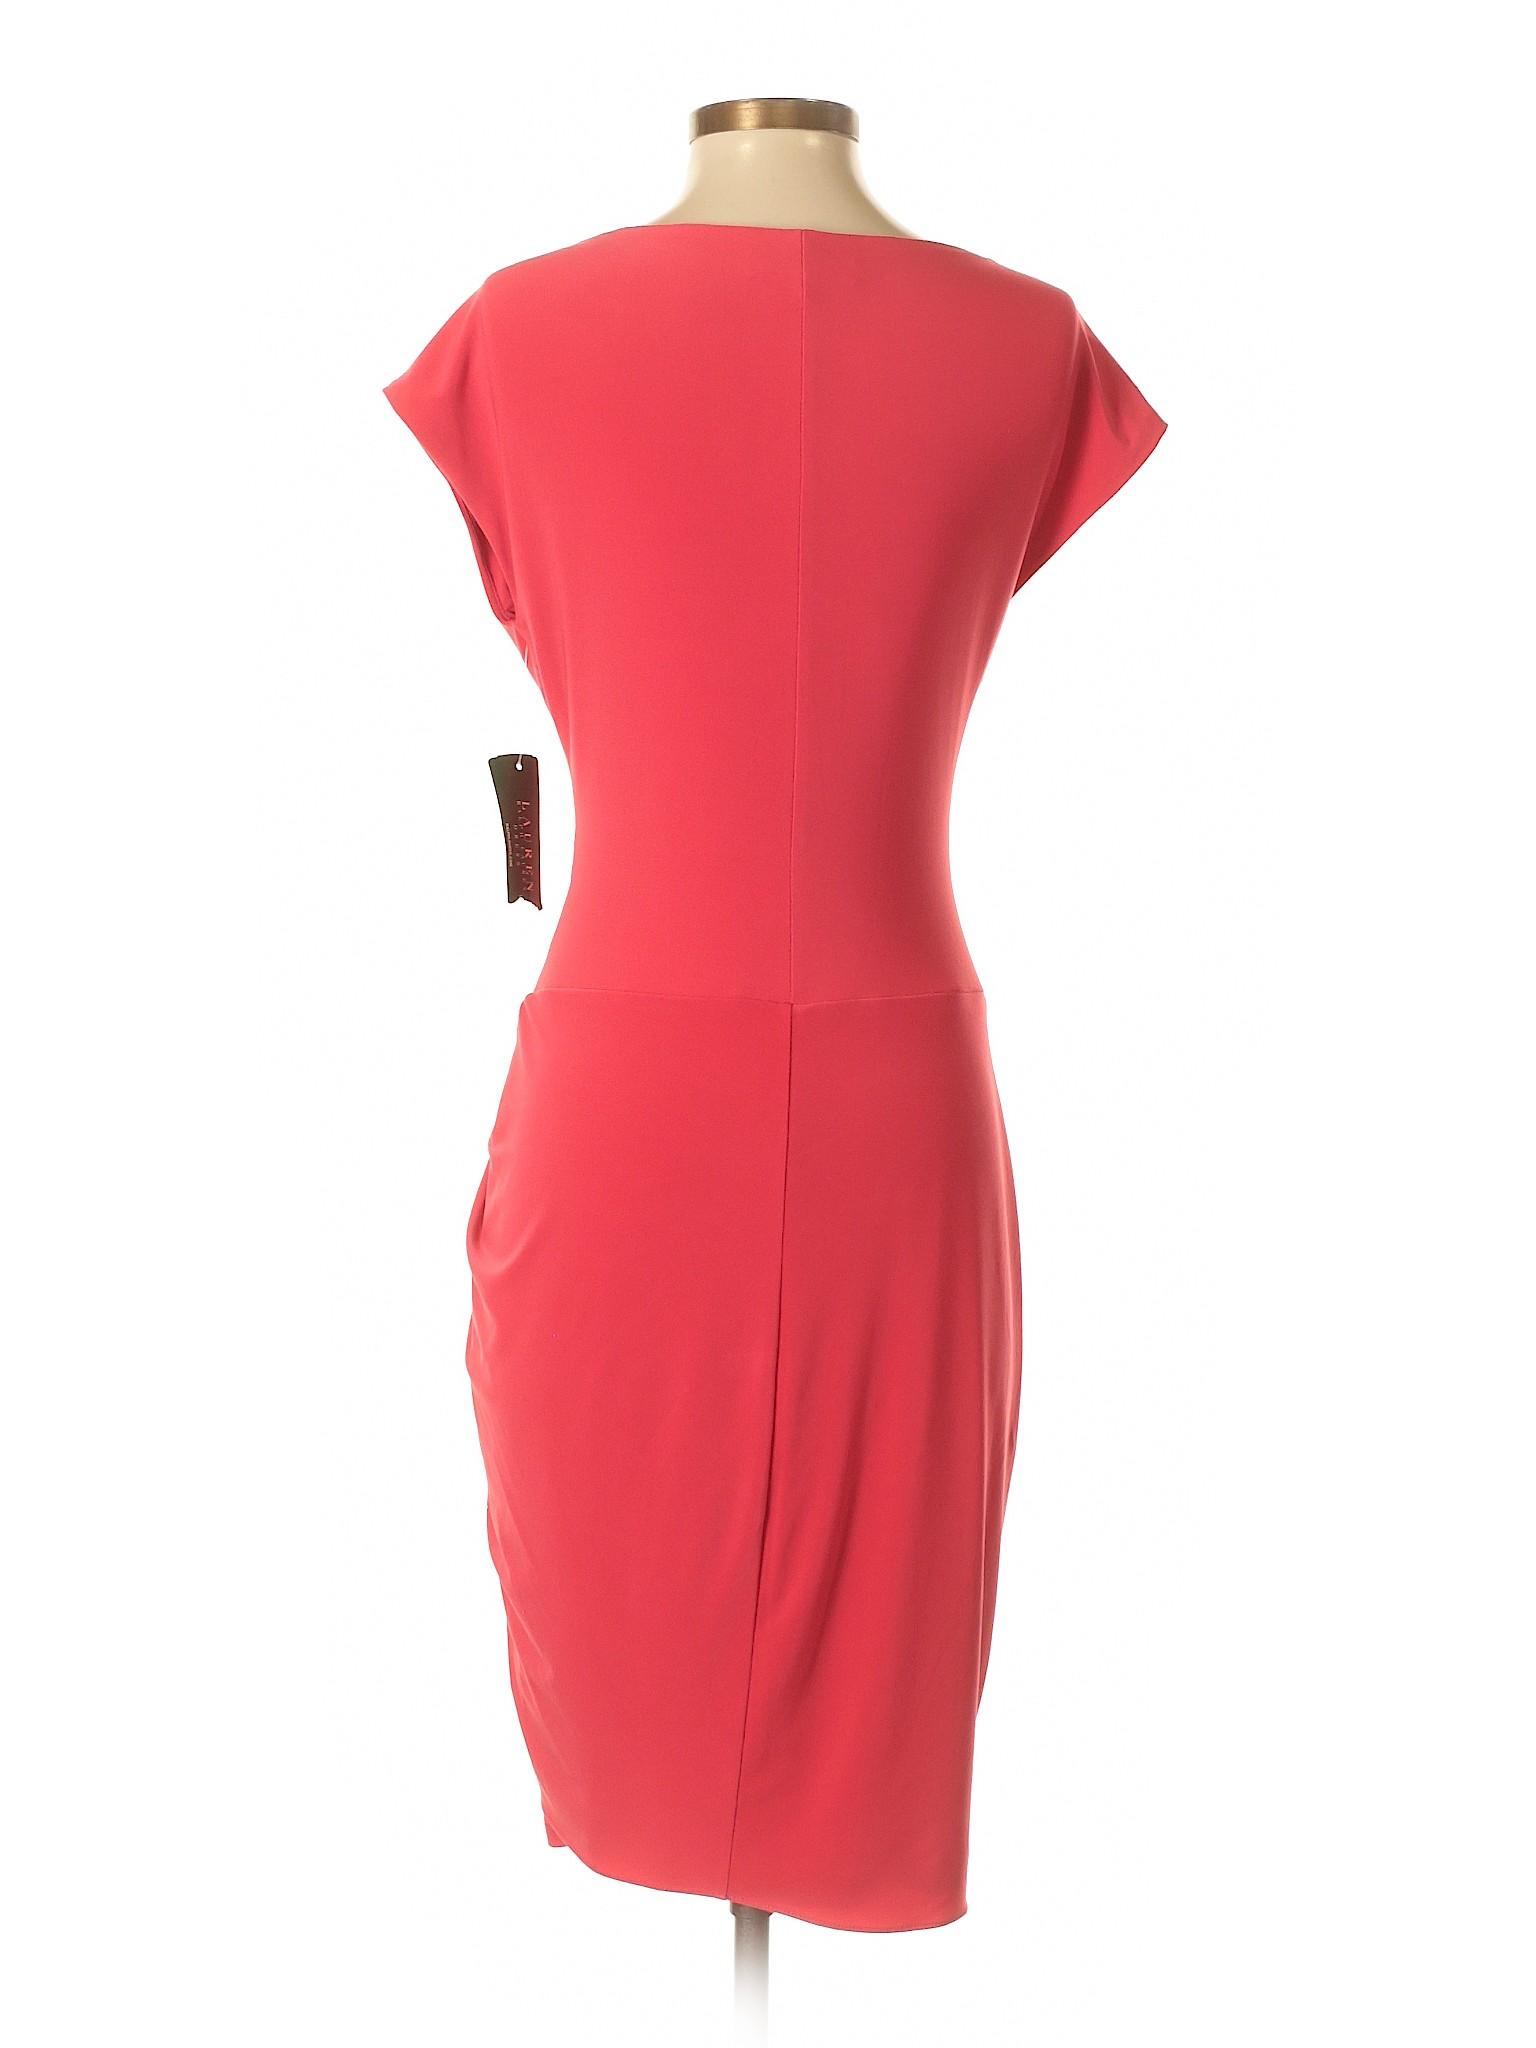 Lauren by Ralph Casual Dress Lauren winter Boutique qxnwZI1x